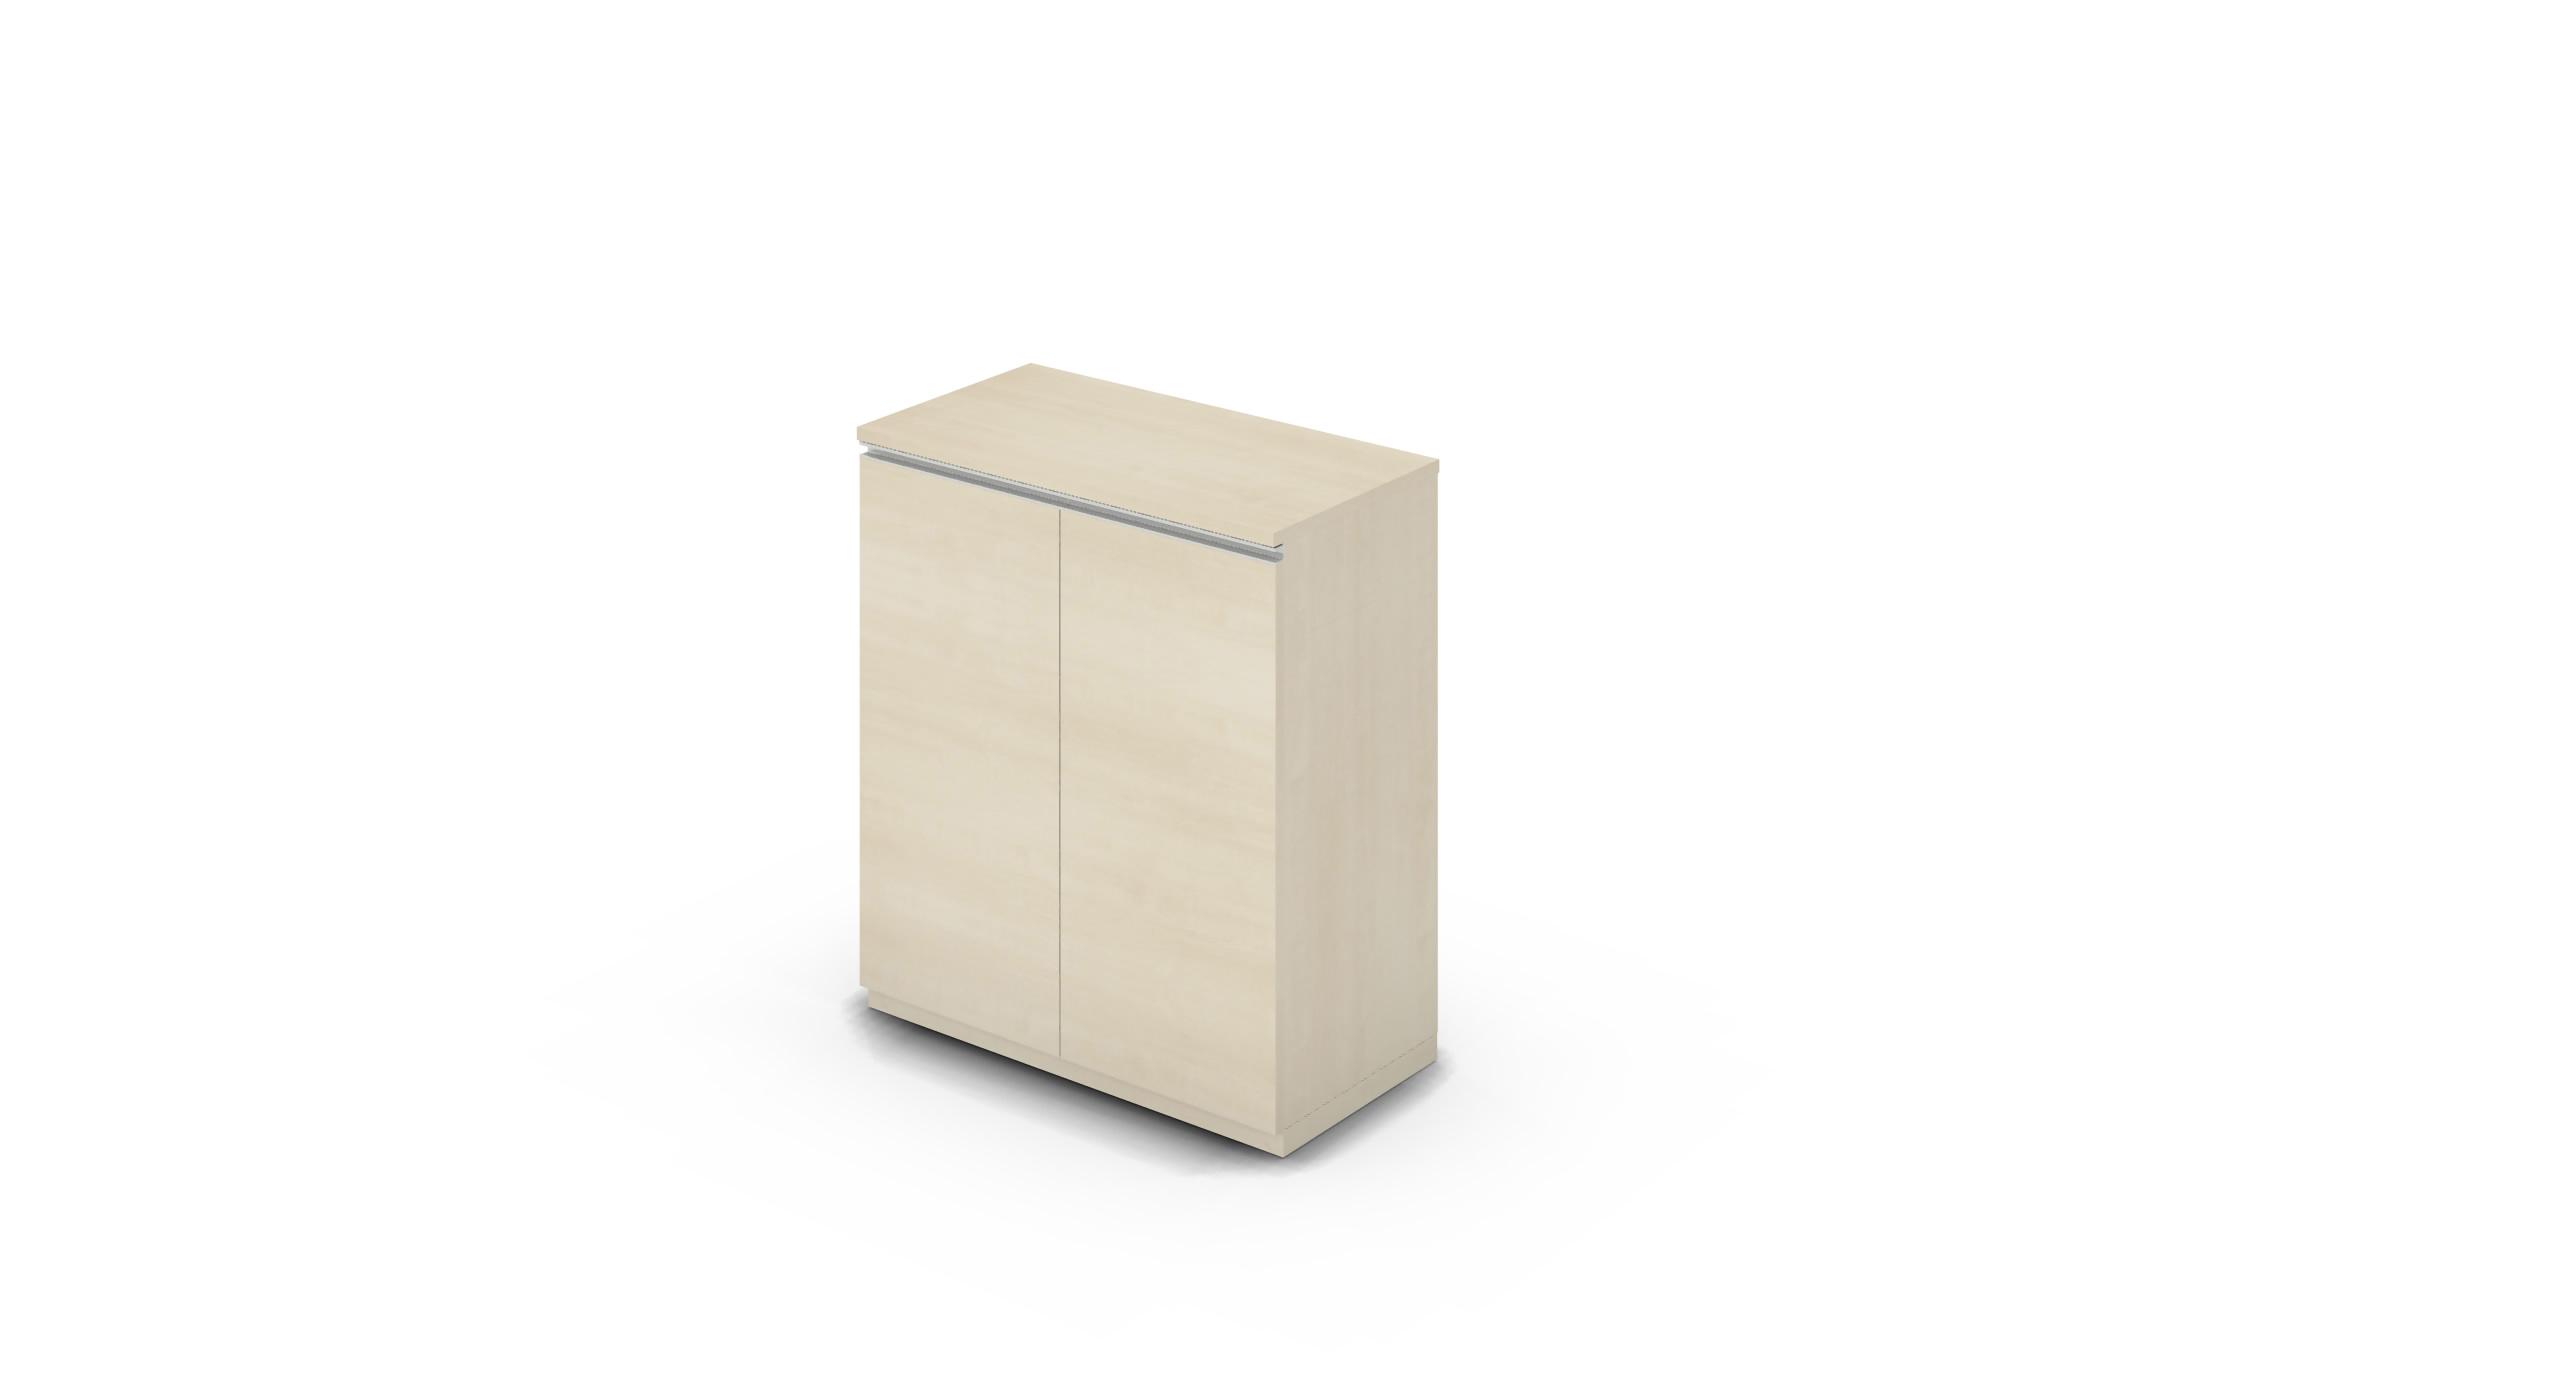 Cabinet_900x450x1125_HD_Maple_Rail_NoCylinder